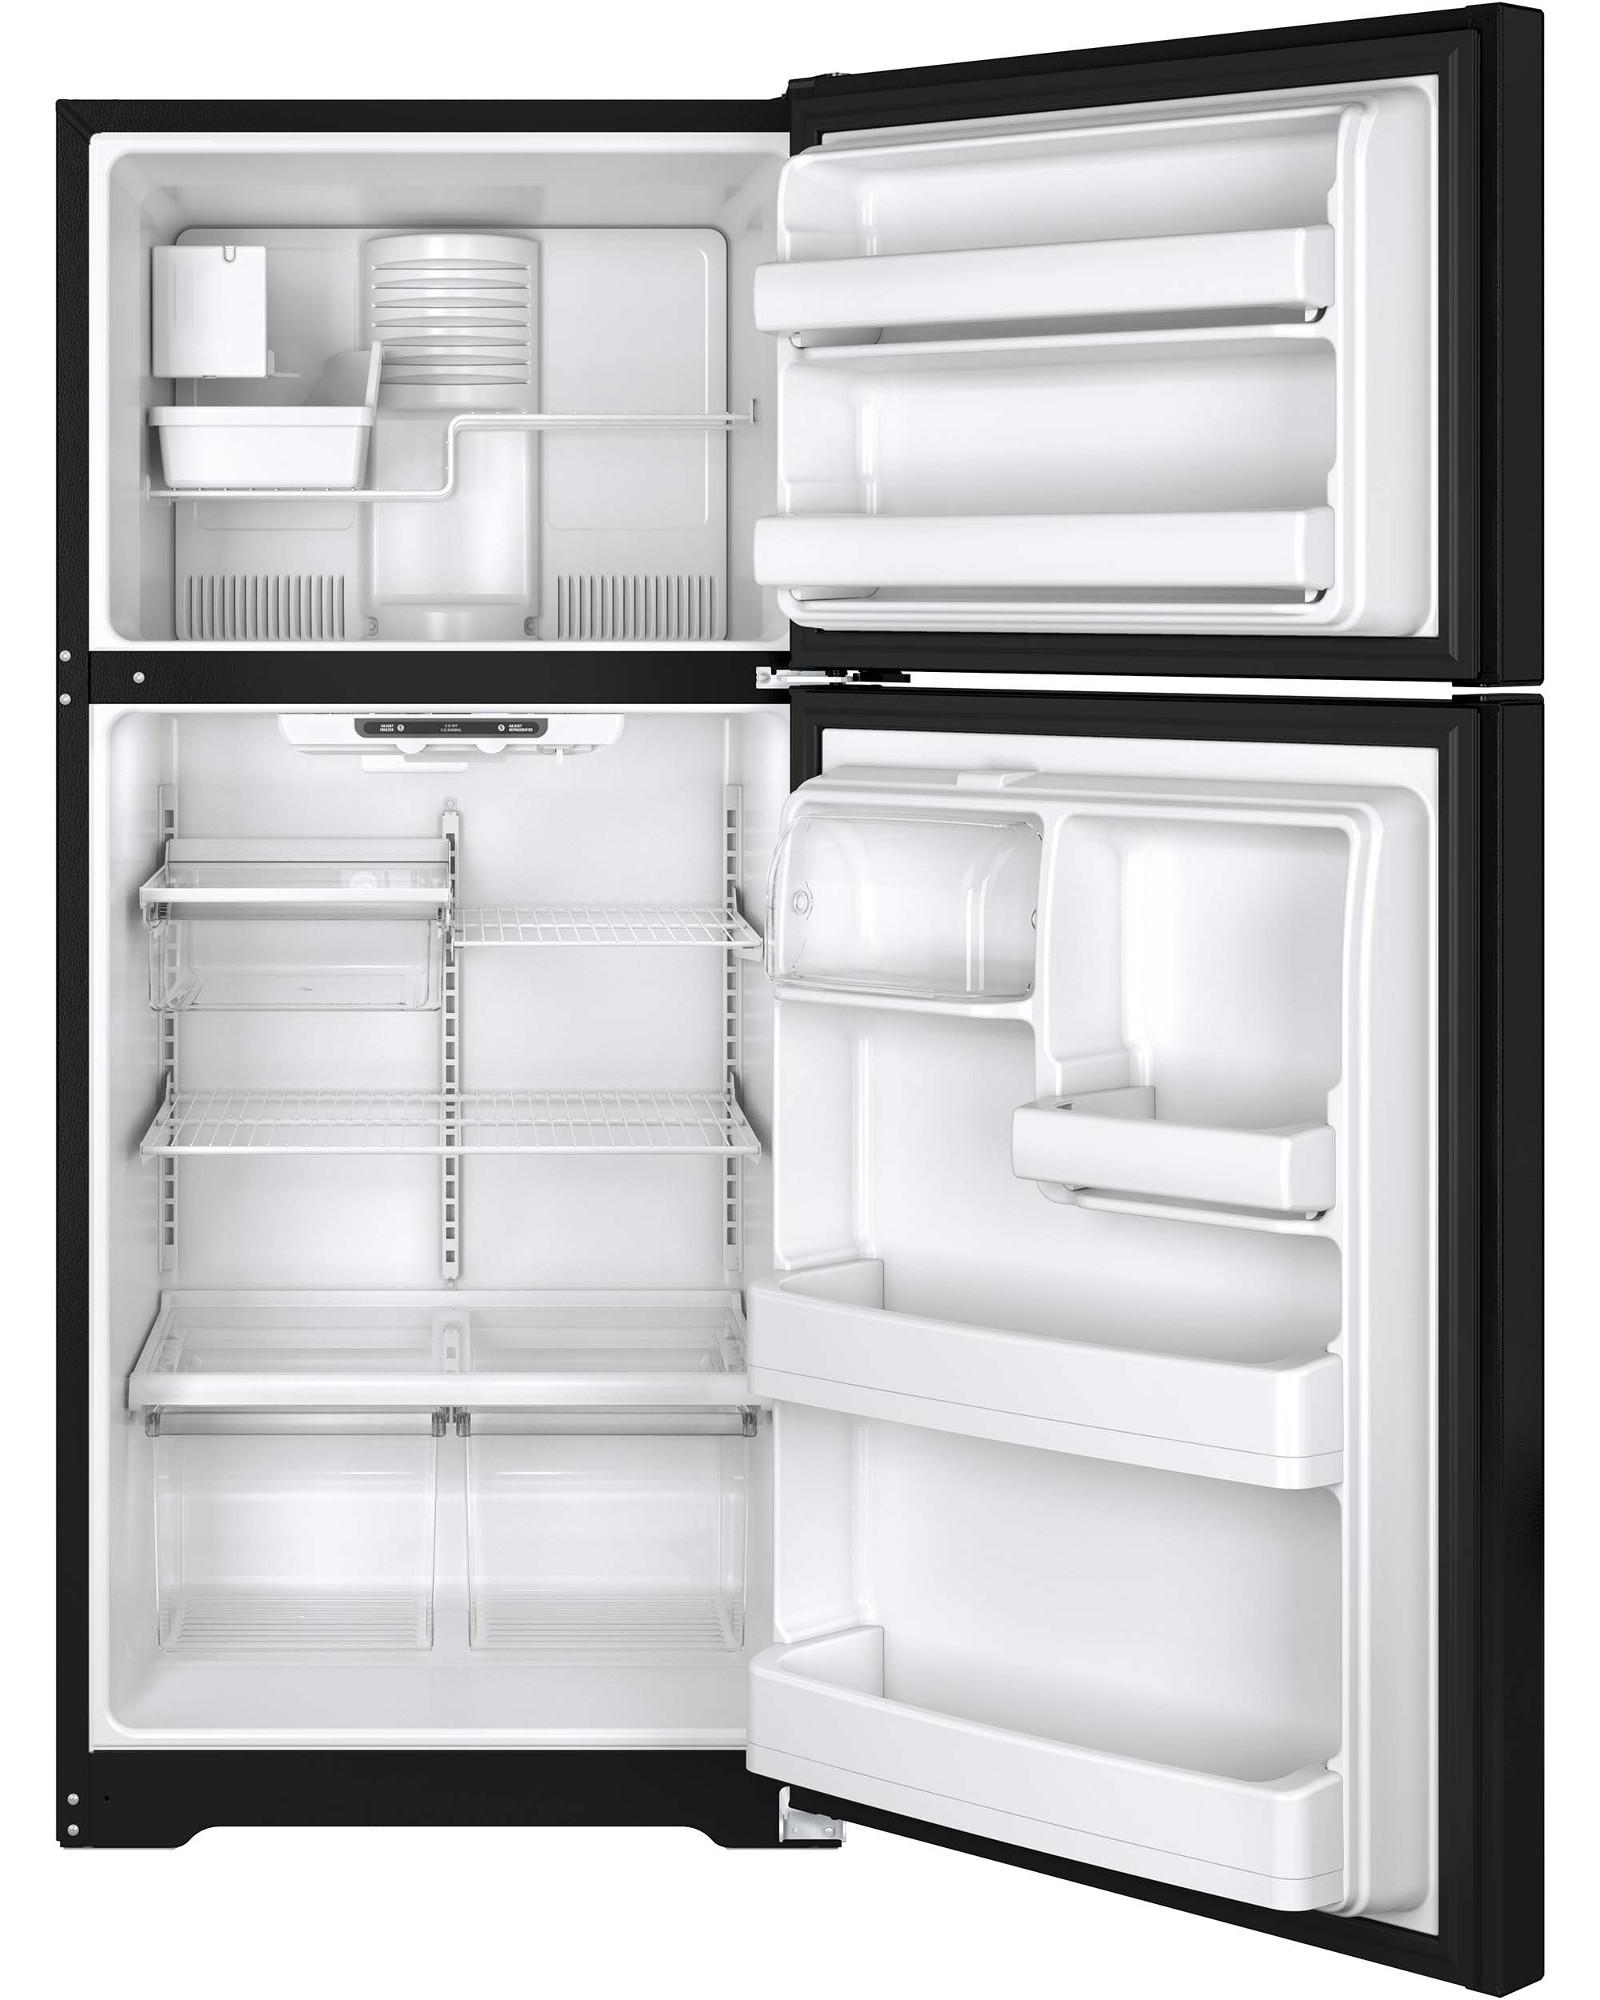 GE Appliances GIE18ETHBB 18.2 cu. ft. Top-Freezer Refrigerator - Black